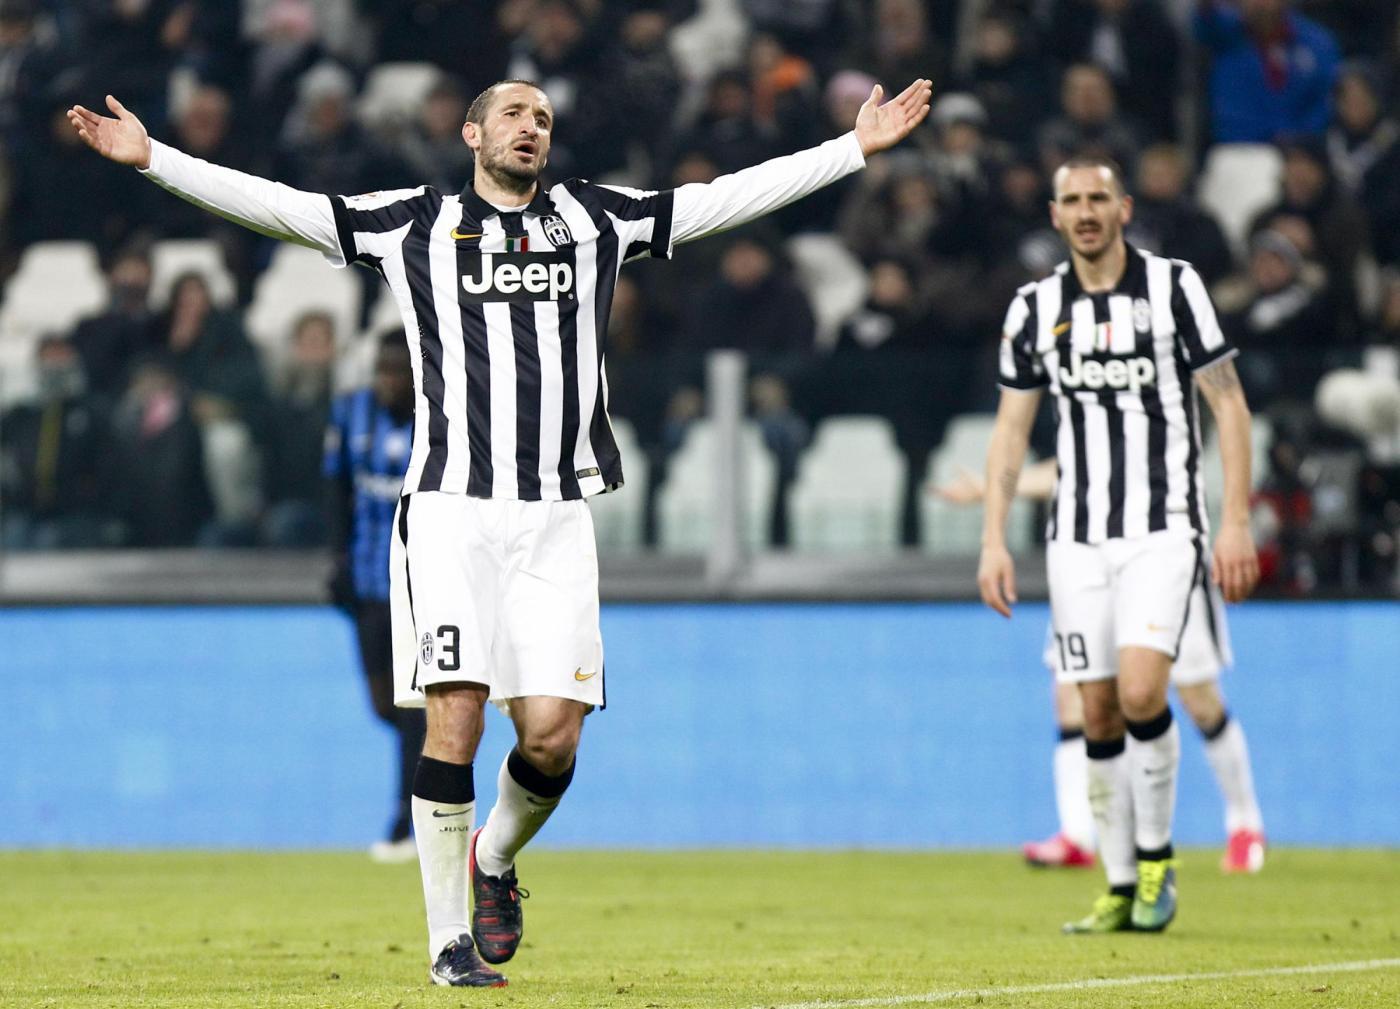 ROMA-JUVENTUS, La diretta|Serie A